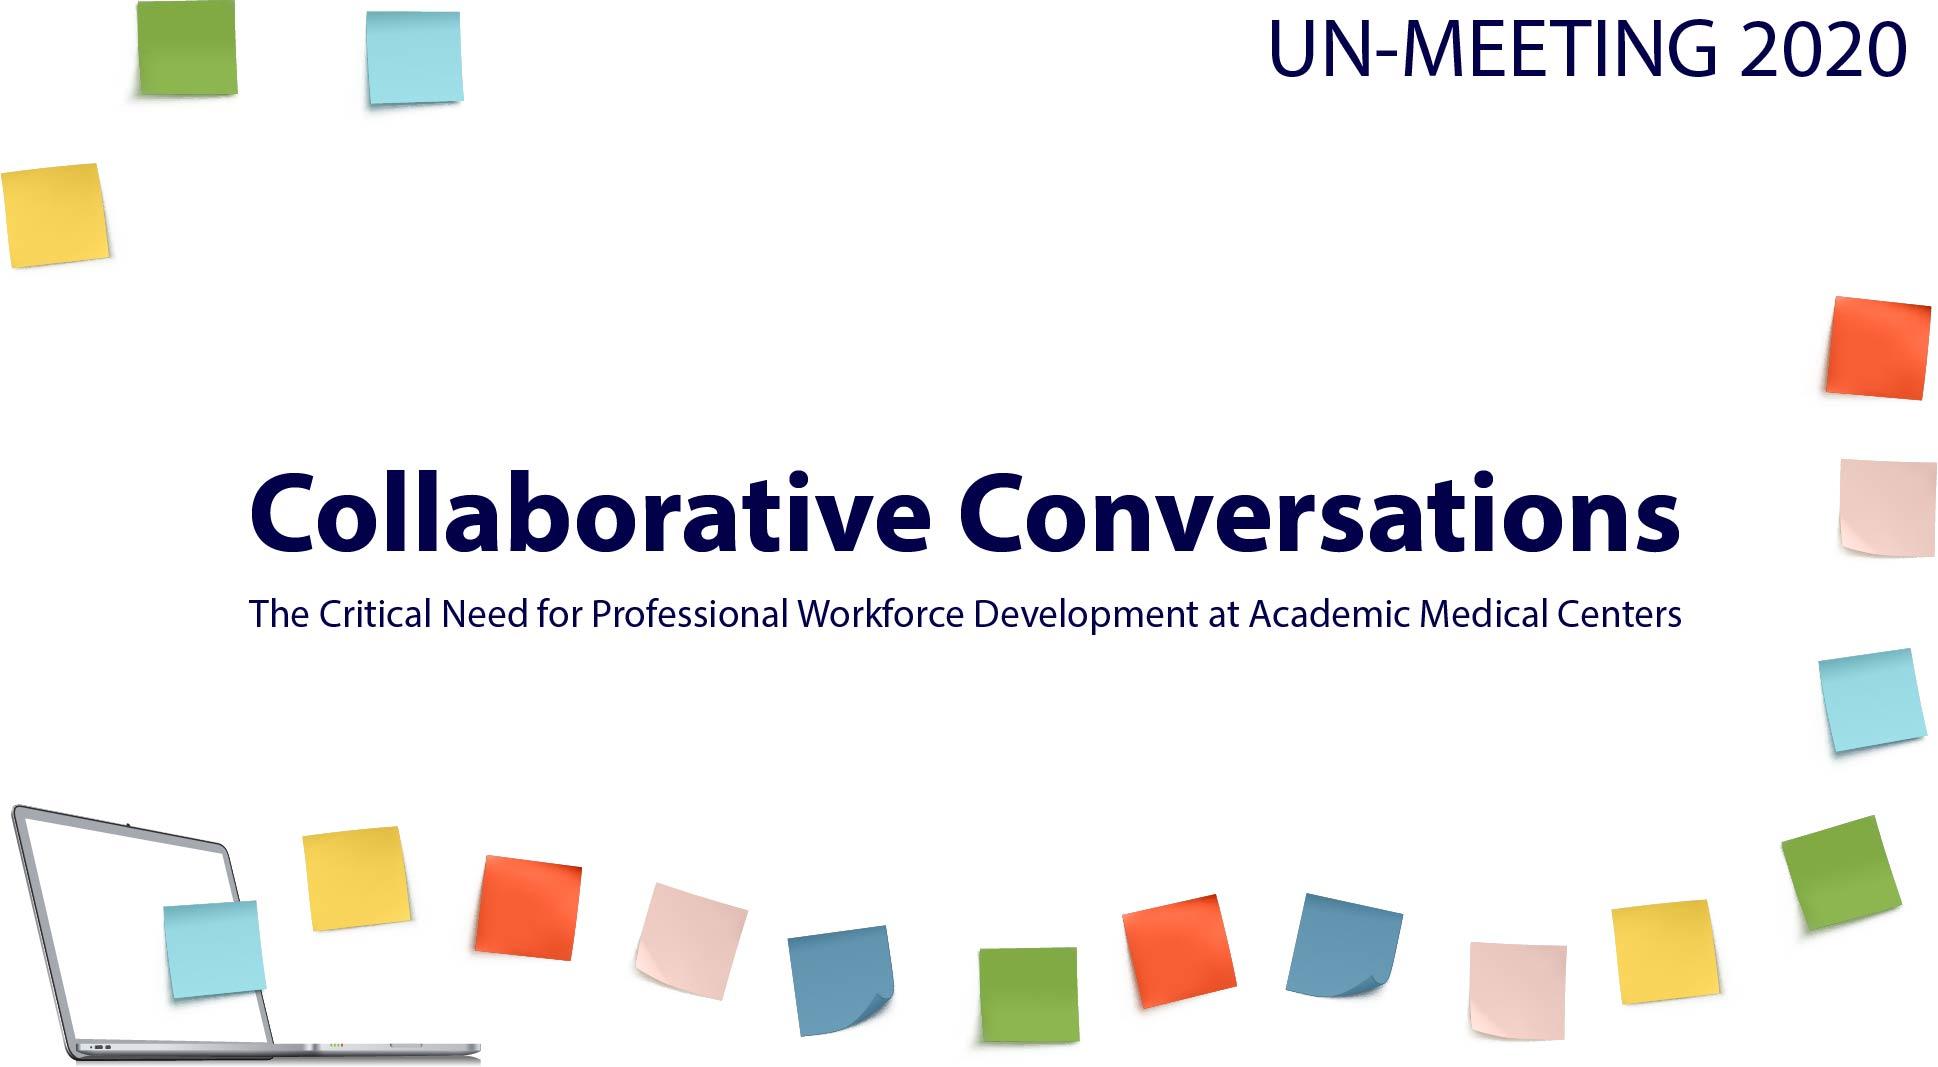 Un-Meeting 2020: Collaborative Conversations